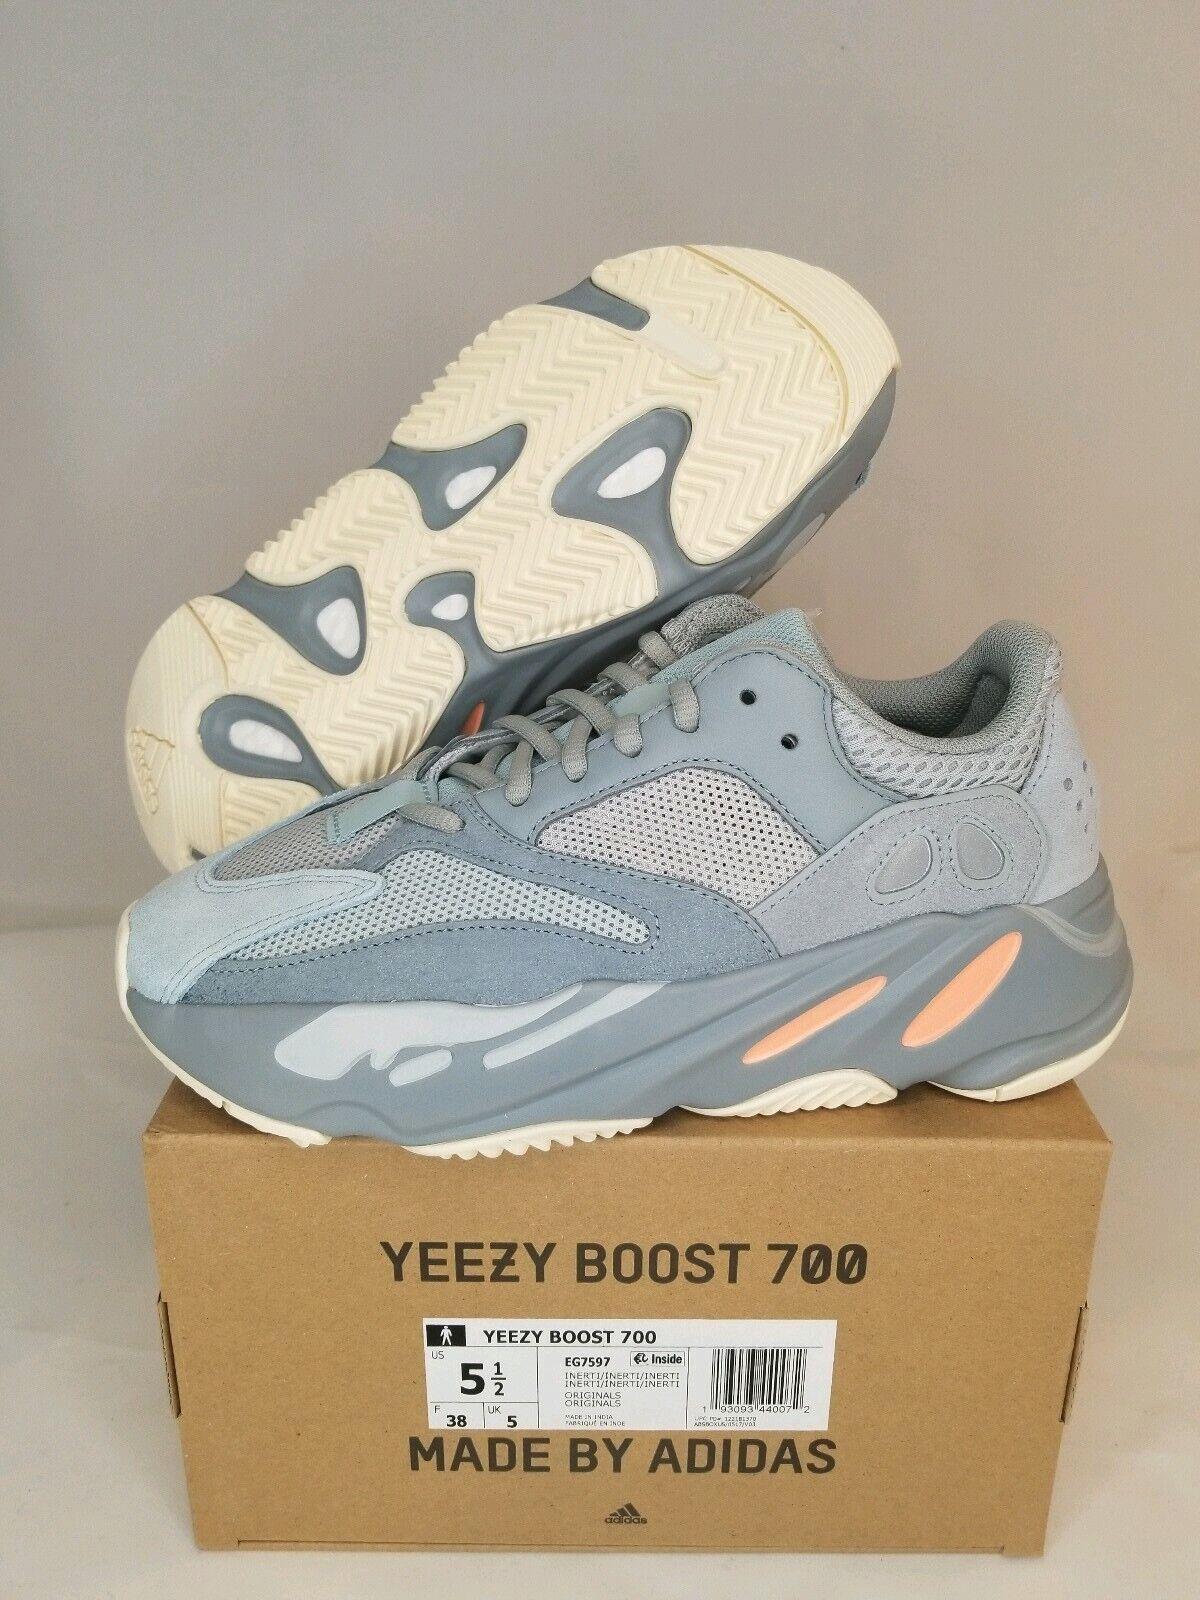 NEW ADIDAS YEEZY BOOST 700 INERTIA MEN'S Size 5.5EG7597 Kanye West